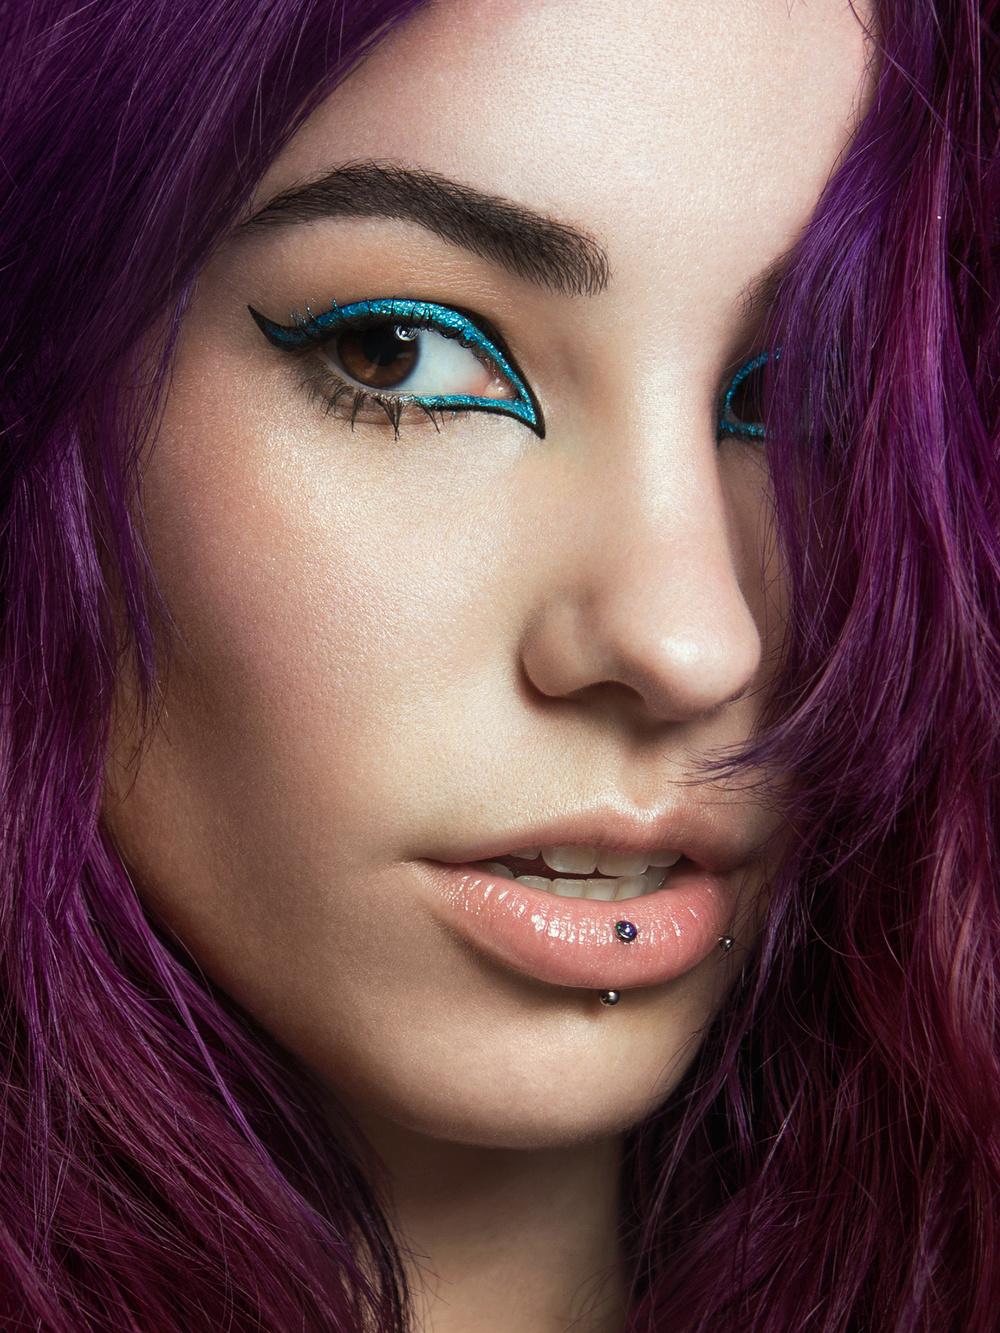 Model: Okidoki Okami. Makeup: Risa Robins-Moloney. Post-production: Marina Dean-Francis.